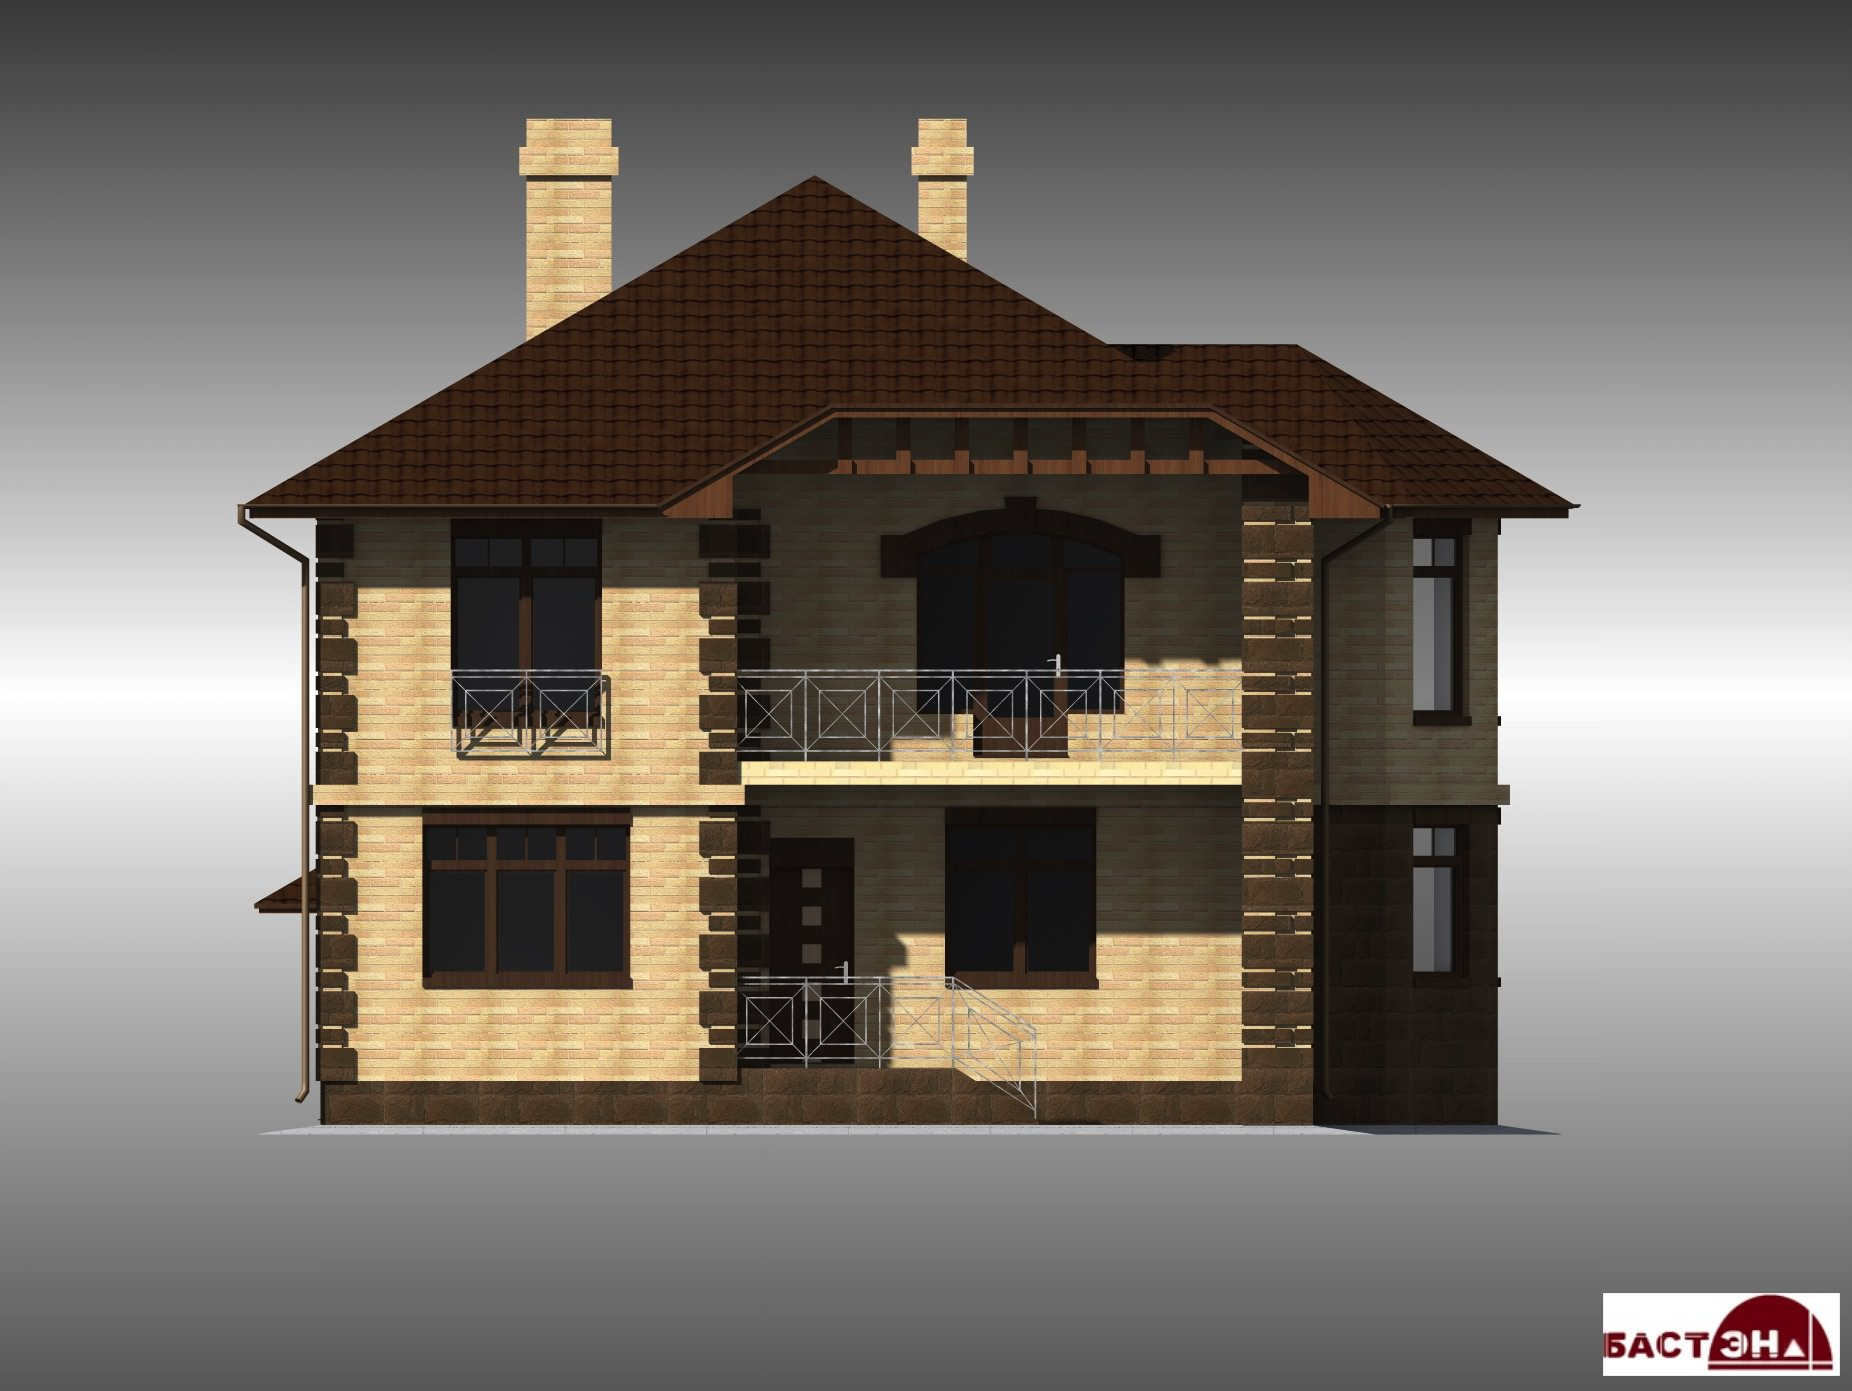 vid-4-individualnyj-dizajn-fasada-tipovogo-proekta-53-31.jpg